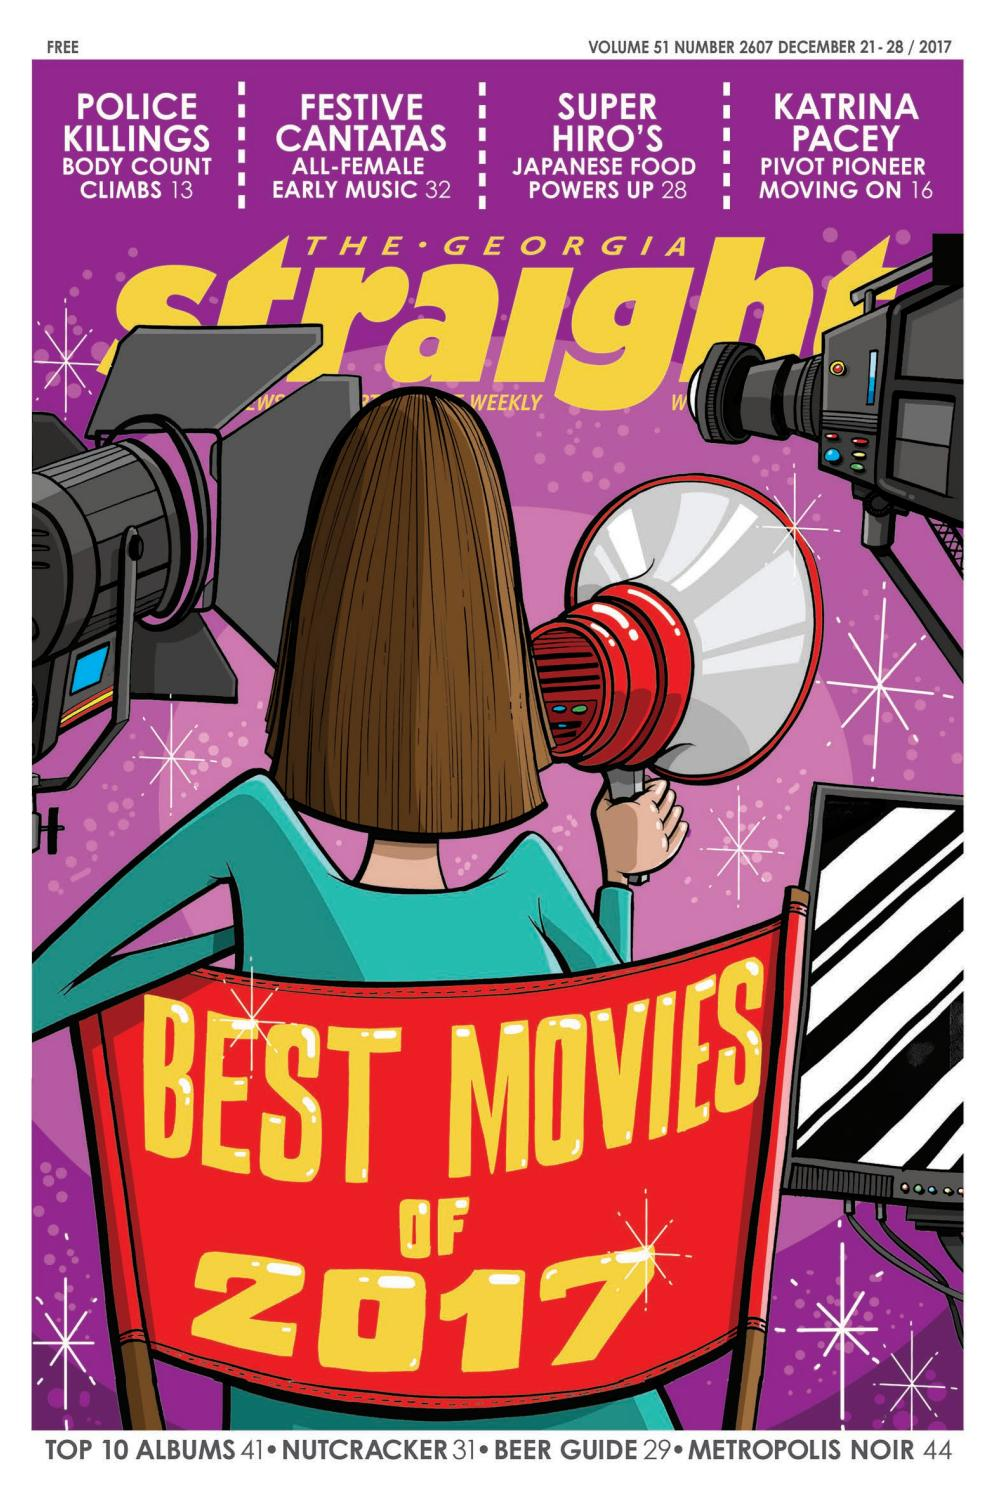 b12d9dccc2b The Georgia Straight - Best Movies of 2017 - Dec 21